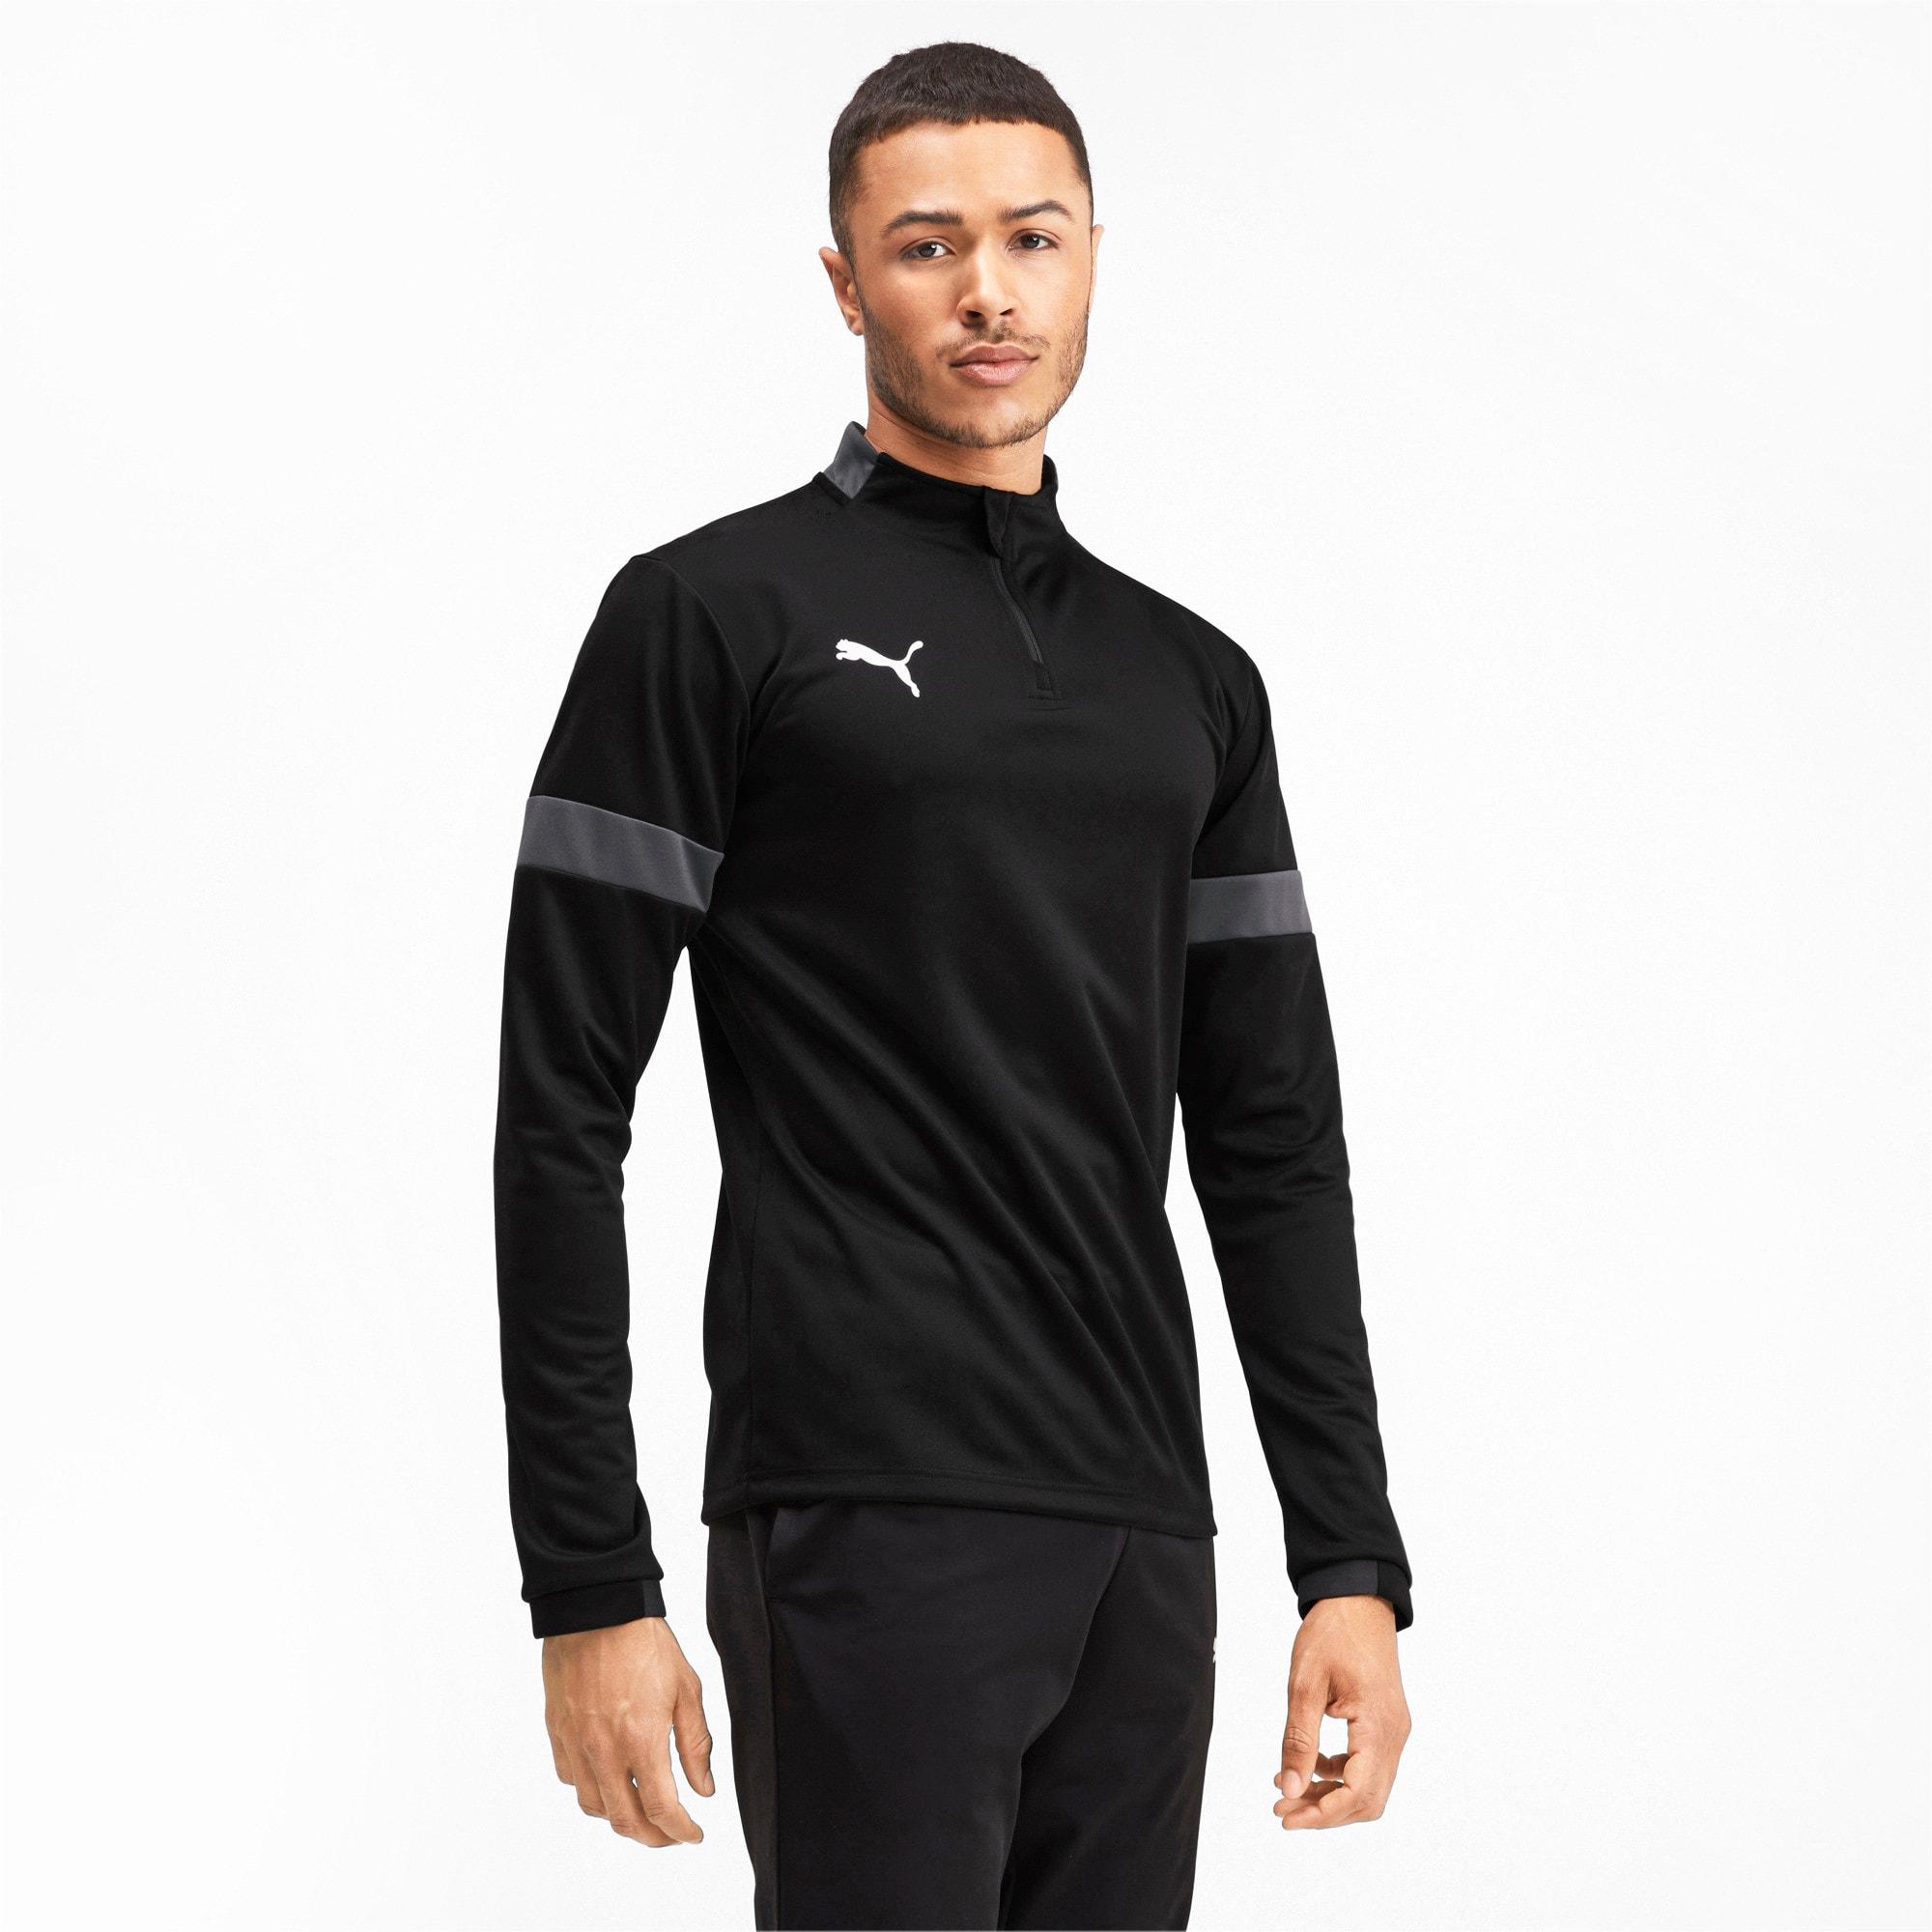 Thumbnail 1 of Sweatshirt pour homme, Puma Black-Asphalt, medium